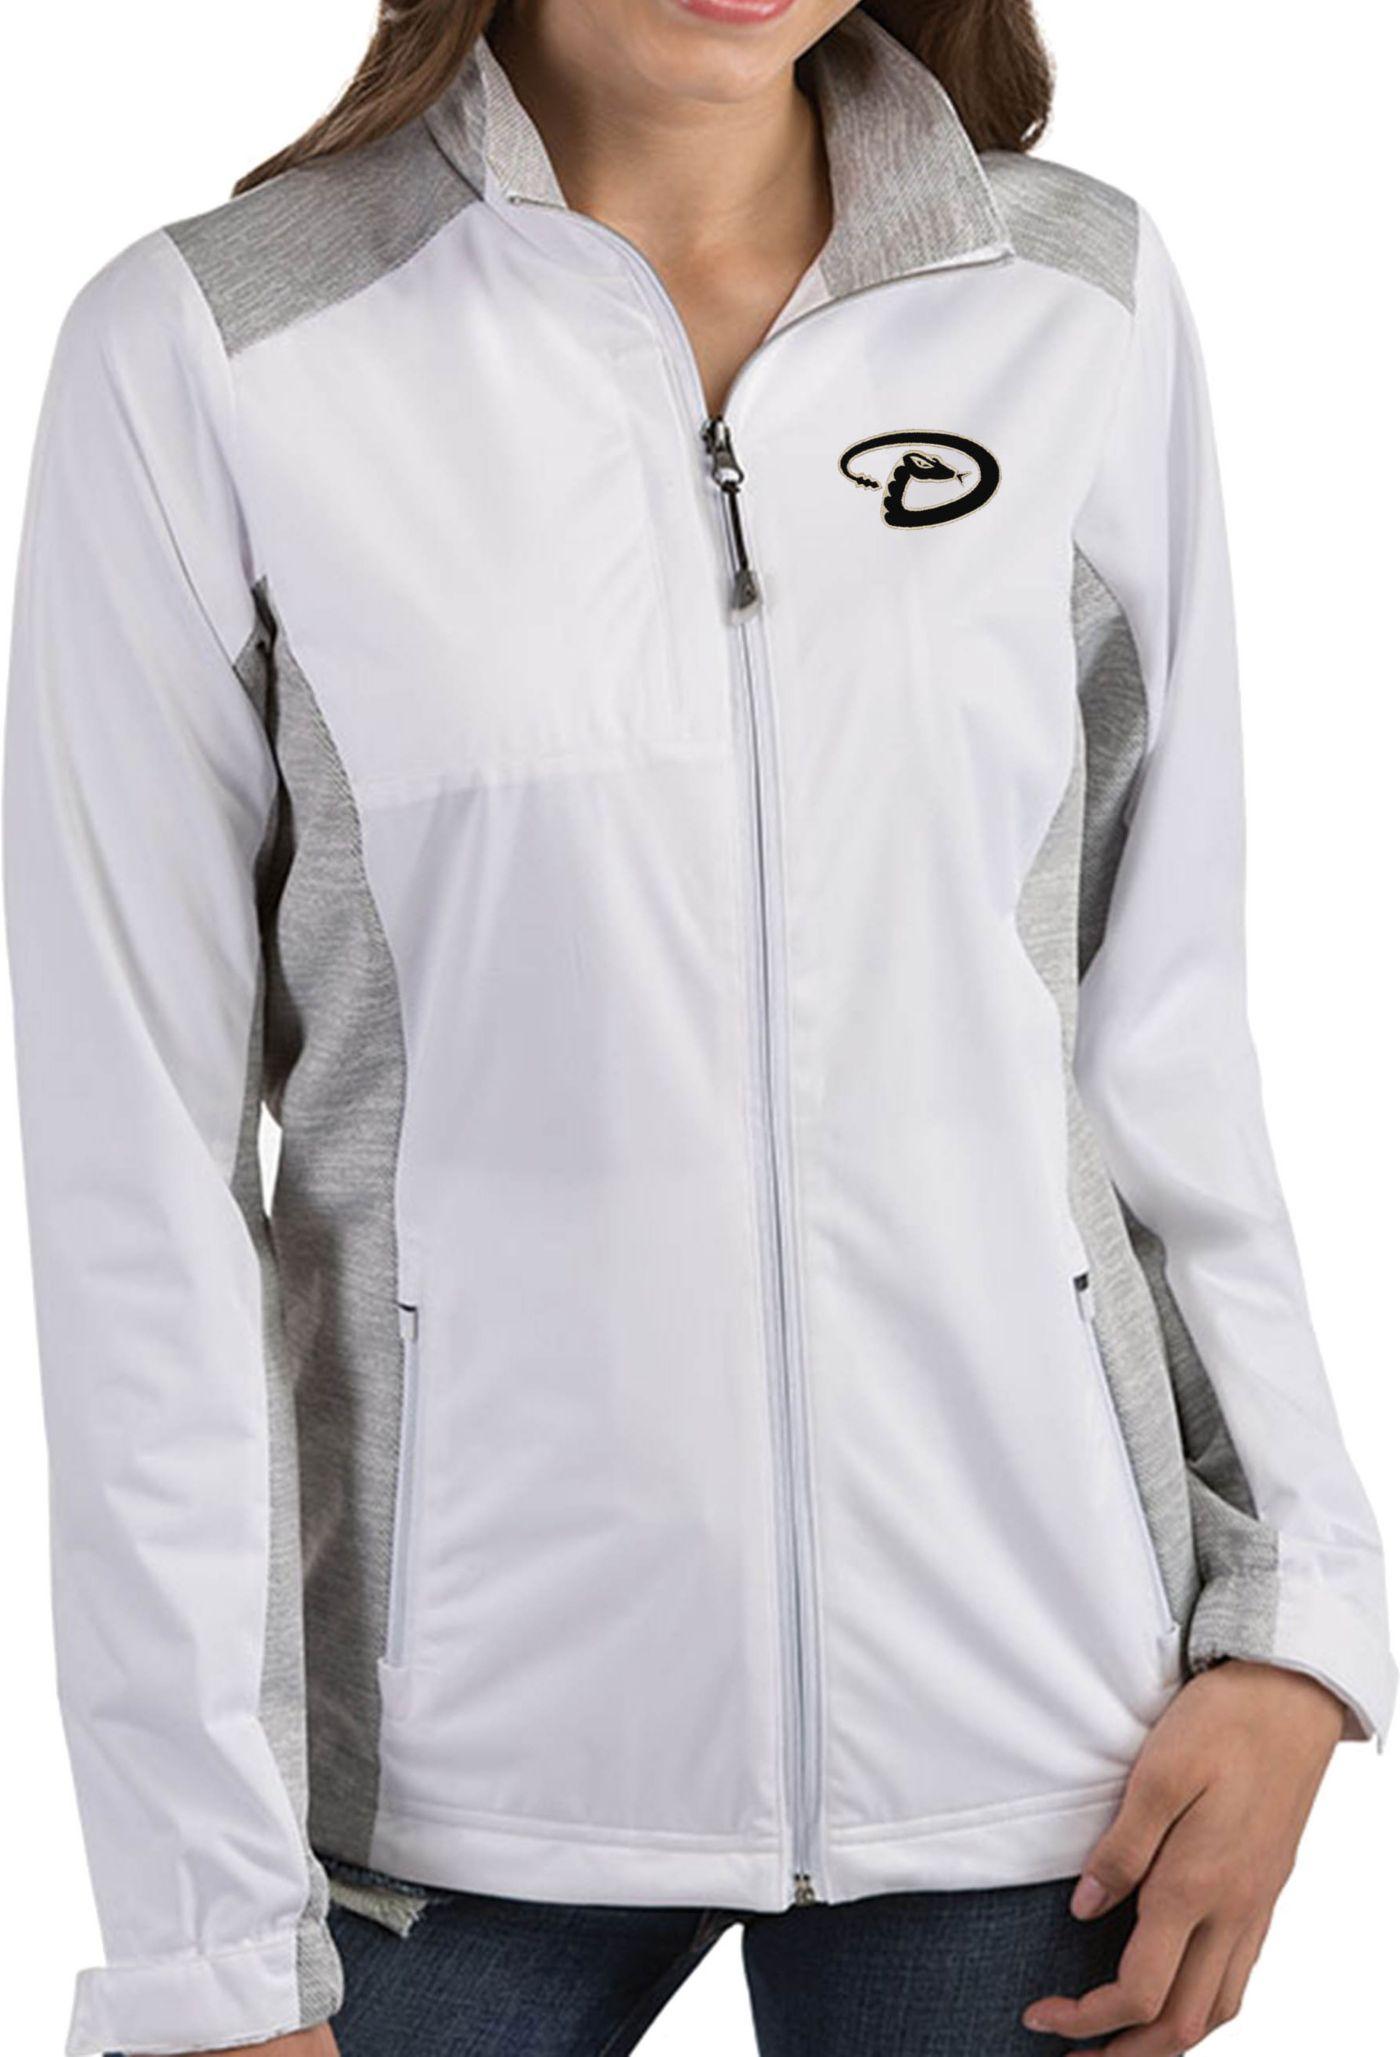 Antigua Women's Arizona Diamondbacks Revolve White Full-Zip Jacket